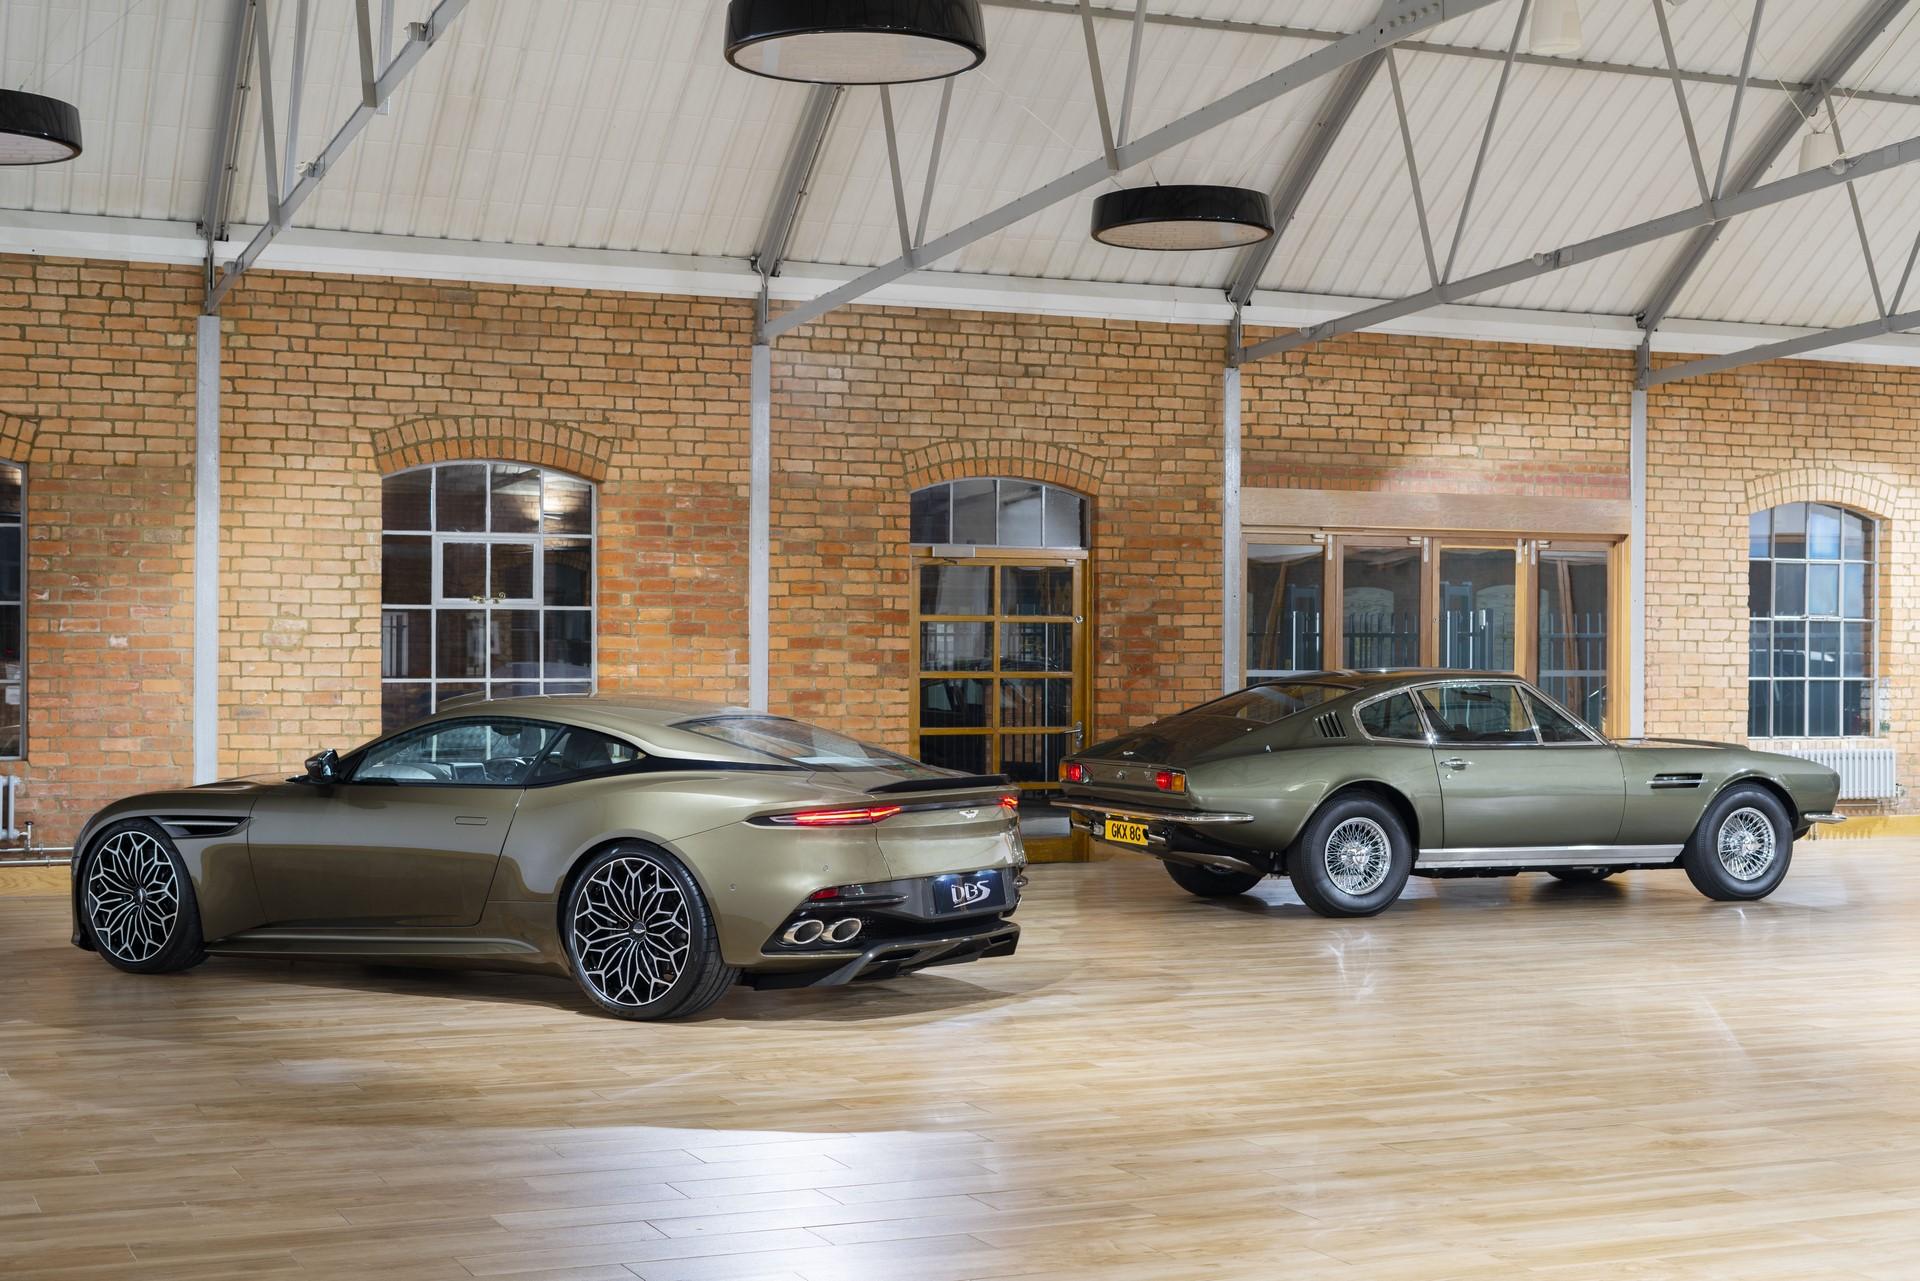 Aston-Martin-DBS-Superleggera-James-Bond-Special-Edition-7